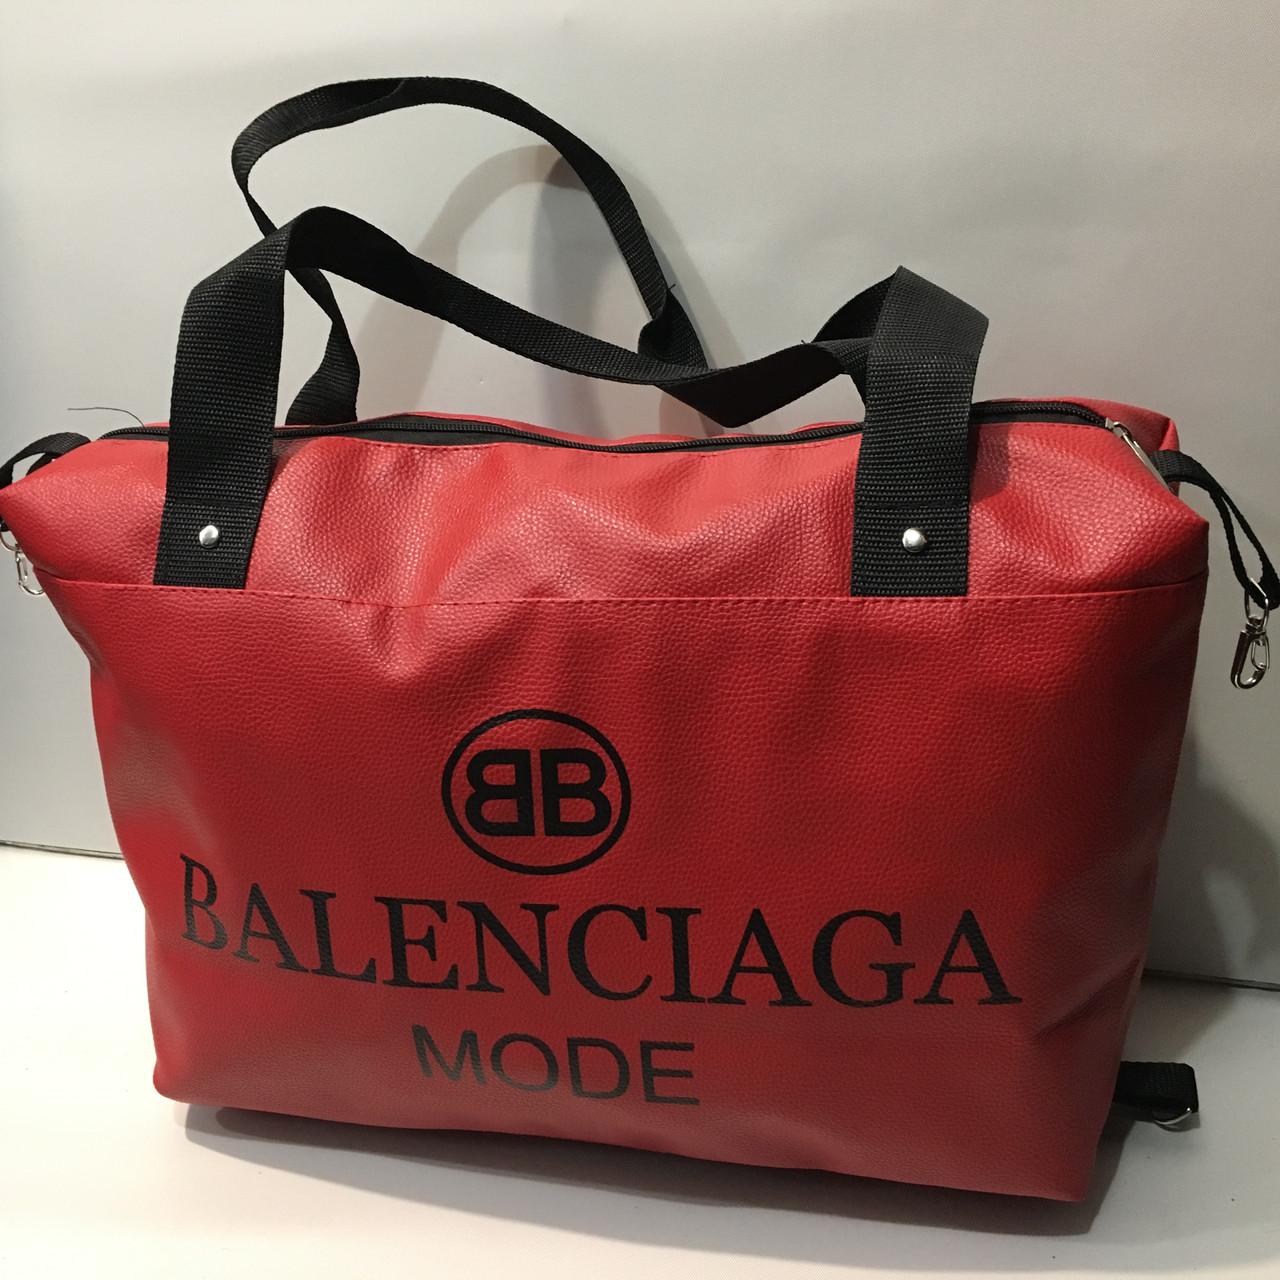 e404530bc506 Спортивная сумка BALENCIAGA оптом: продажа, цена в Харькове ...